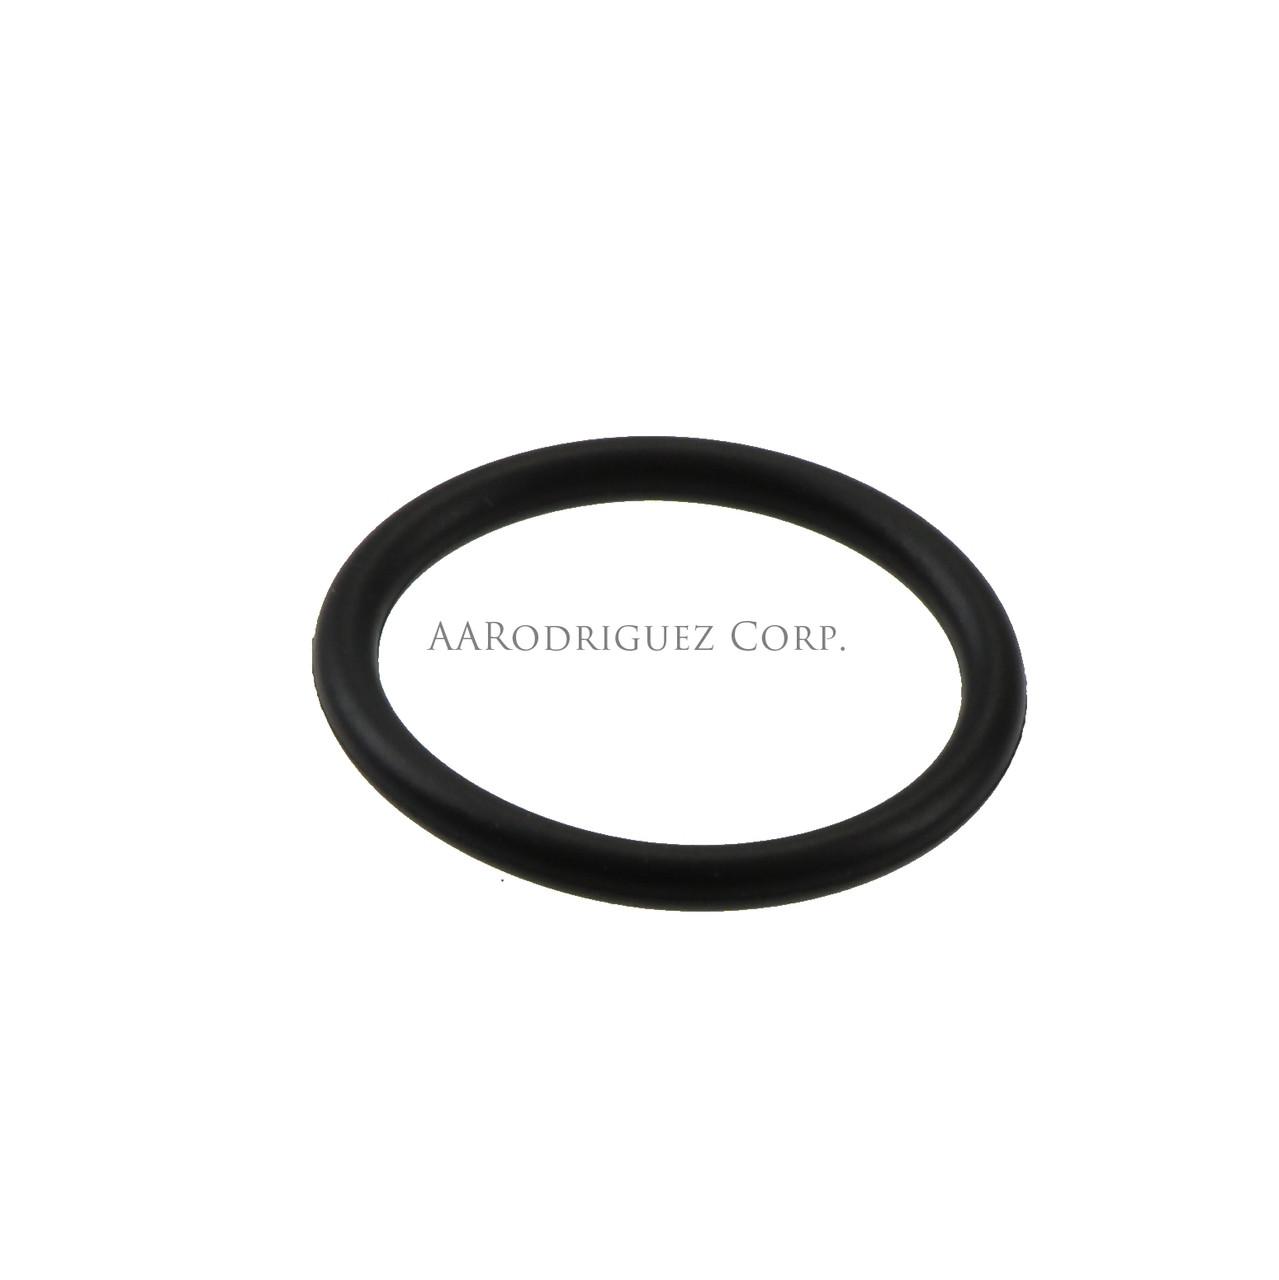 Vw Bug Engine Case Sealant: Oil Tube Return Line Gasket O-Ring N90715601